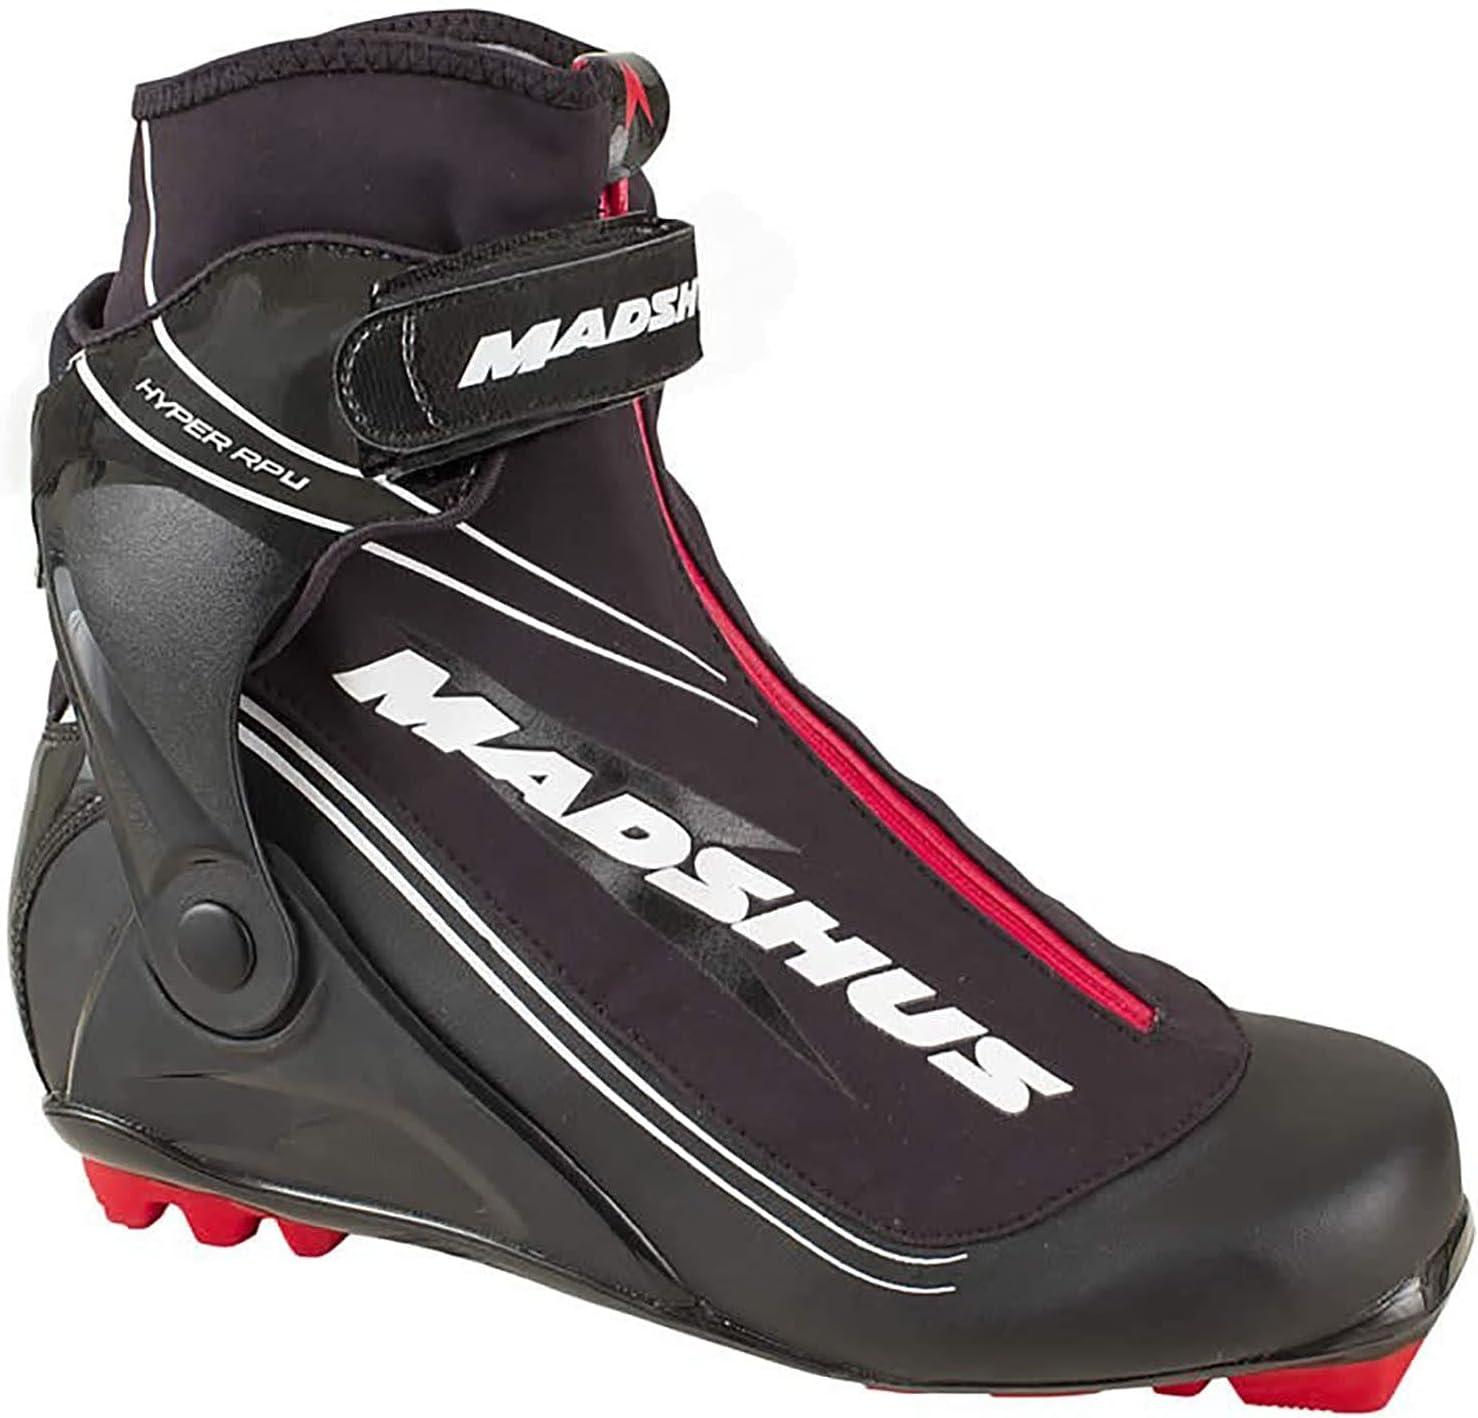 Madshus Hyper RPU Combi Boots Superior XC Ranking TOP9 Ski Kids